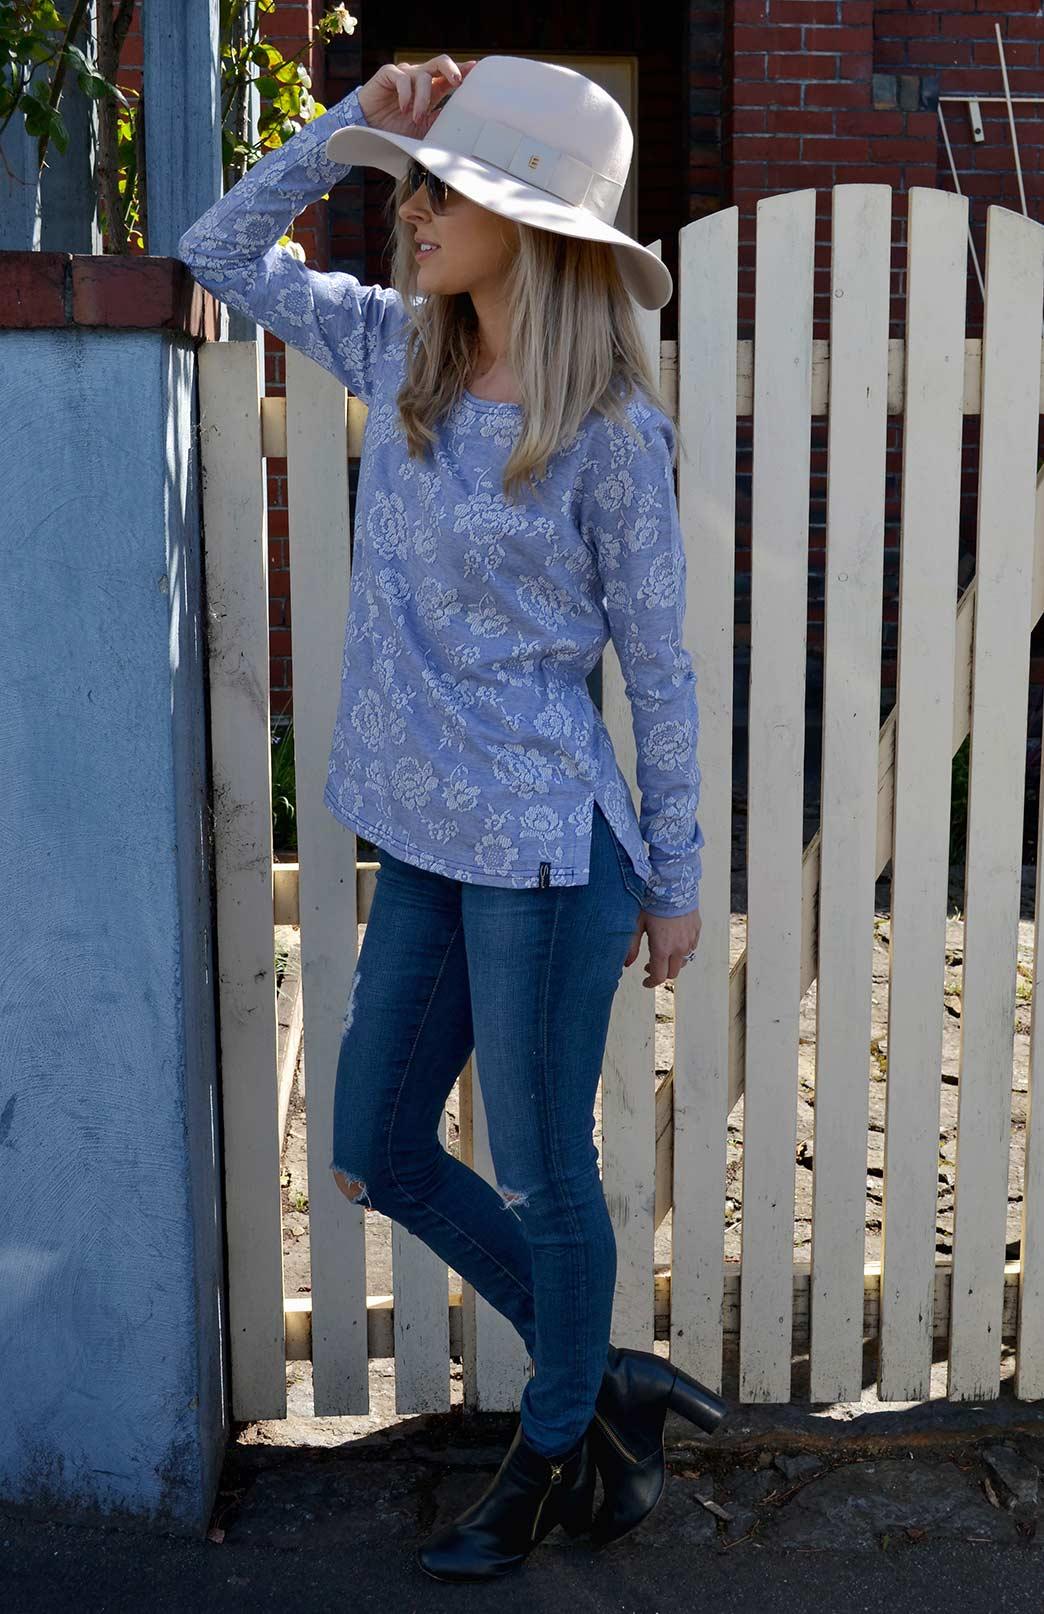 Lucy Top - Women's Long Sleeve Cotton Top - Smitten Merino Tasmania Australia